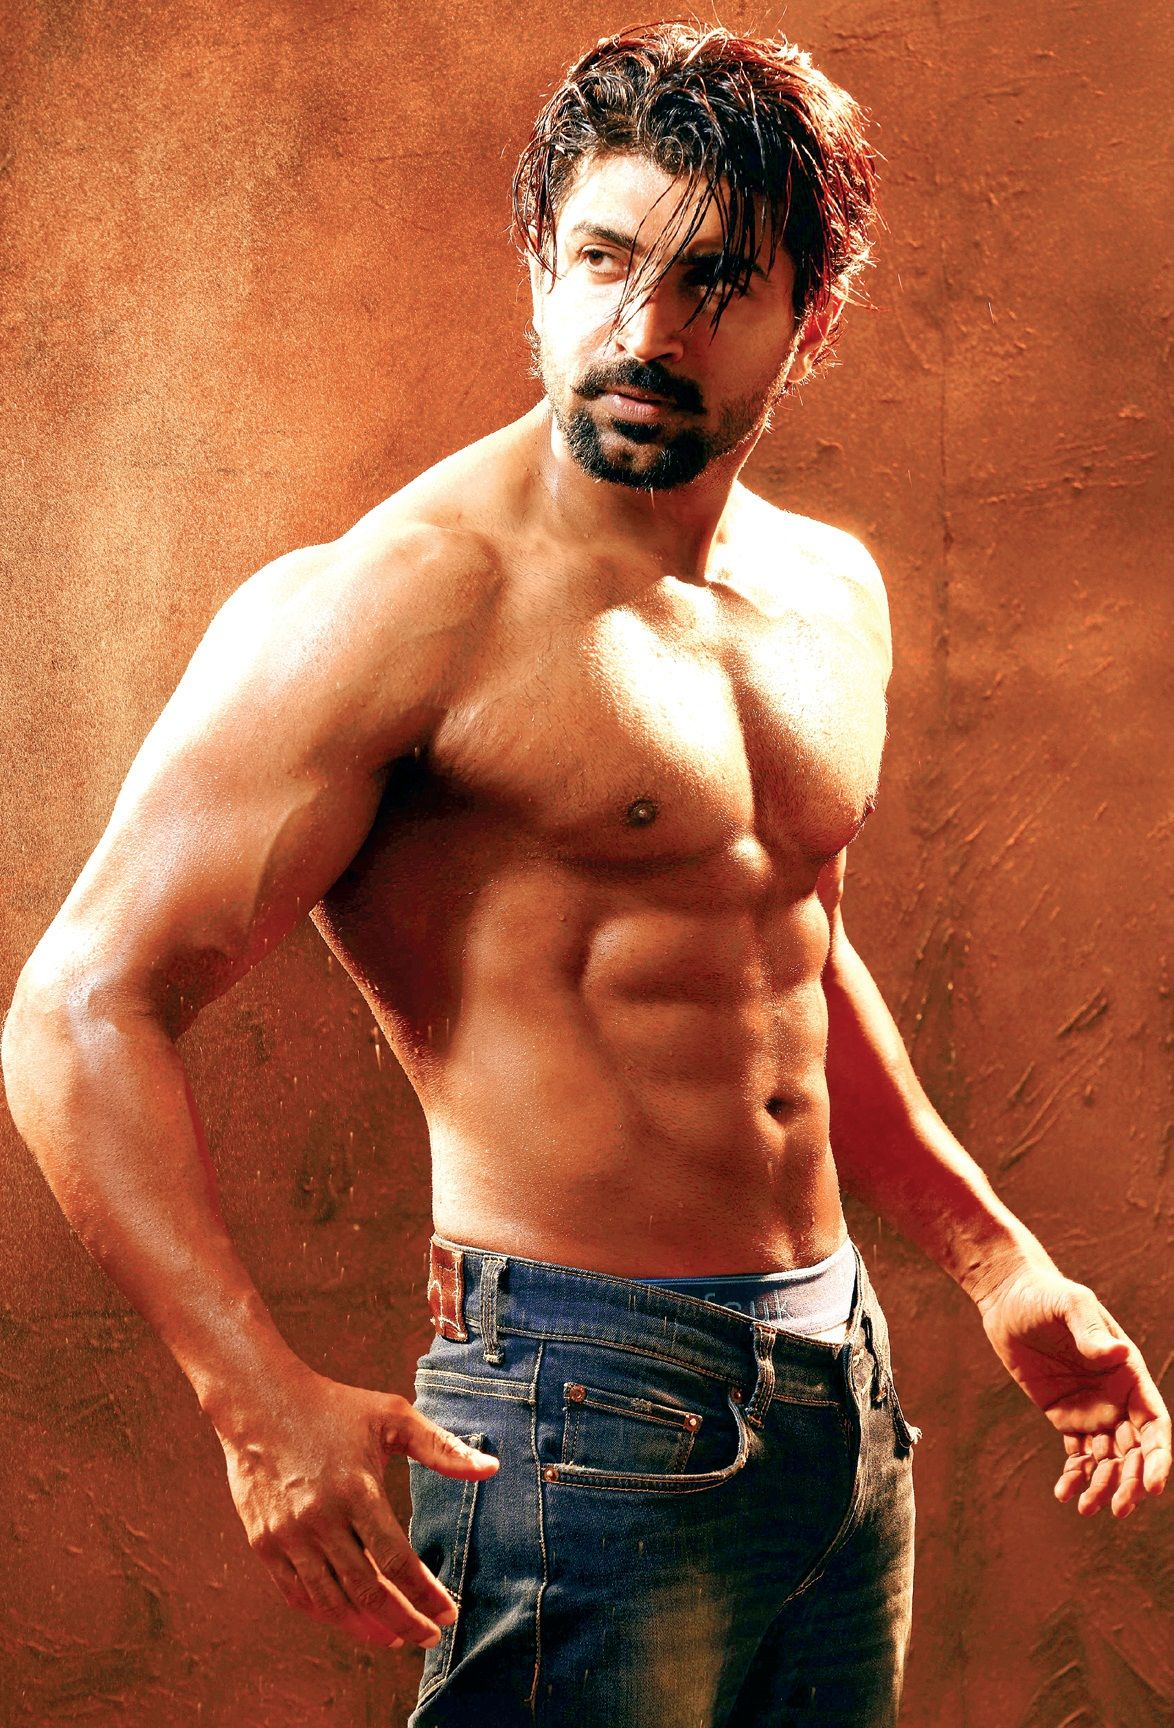 Arun Vijay Wallpapers - Top Free Arun Vijay Backgrounds ...